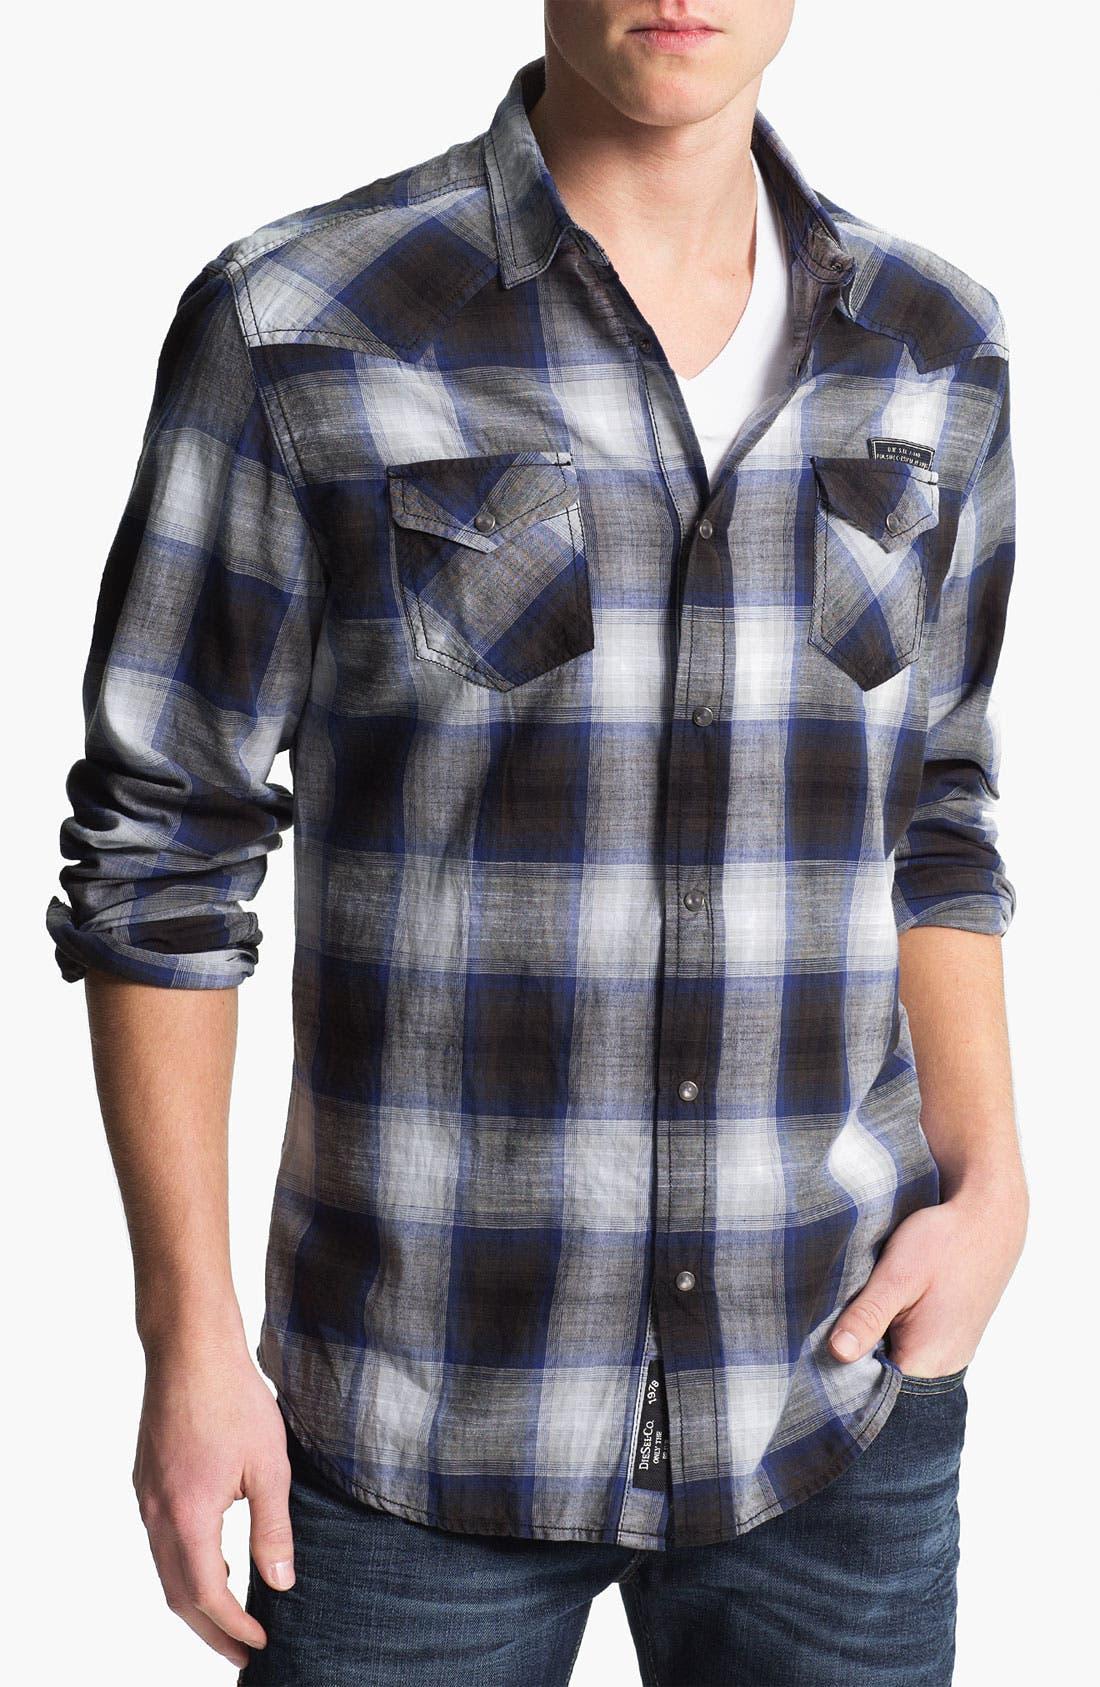 Alternate Image 1 Selected - DIESEL® 'Sulphur' Woven Shirt